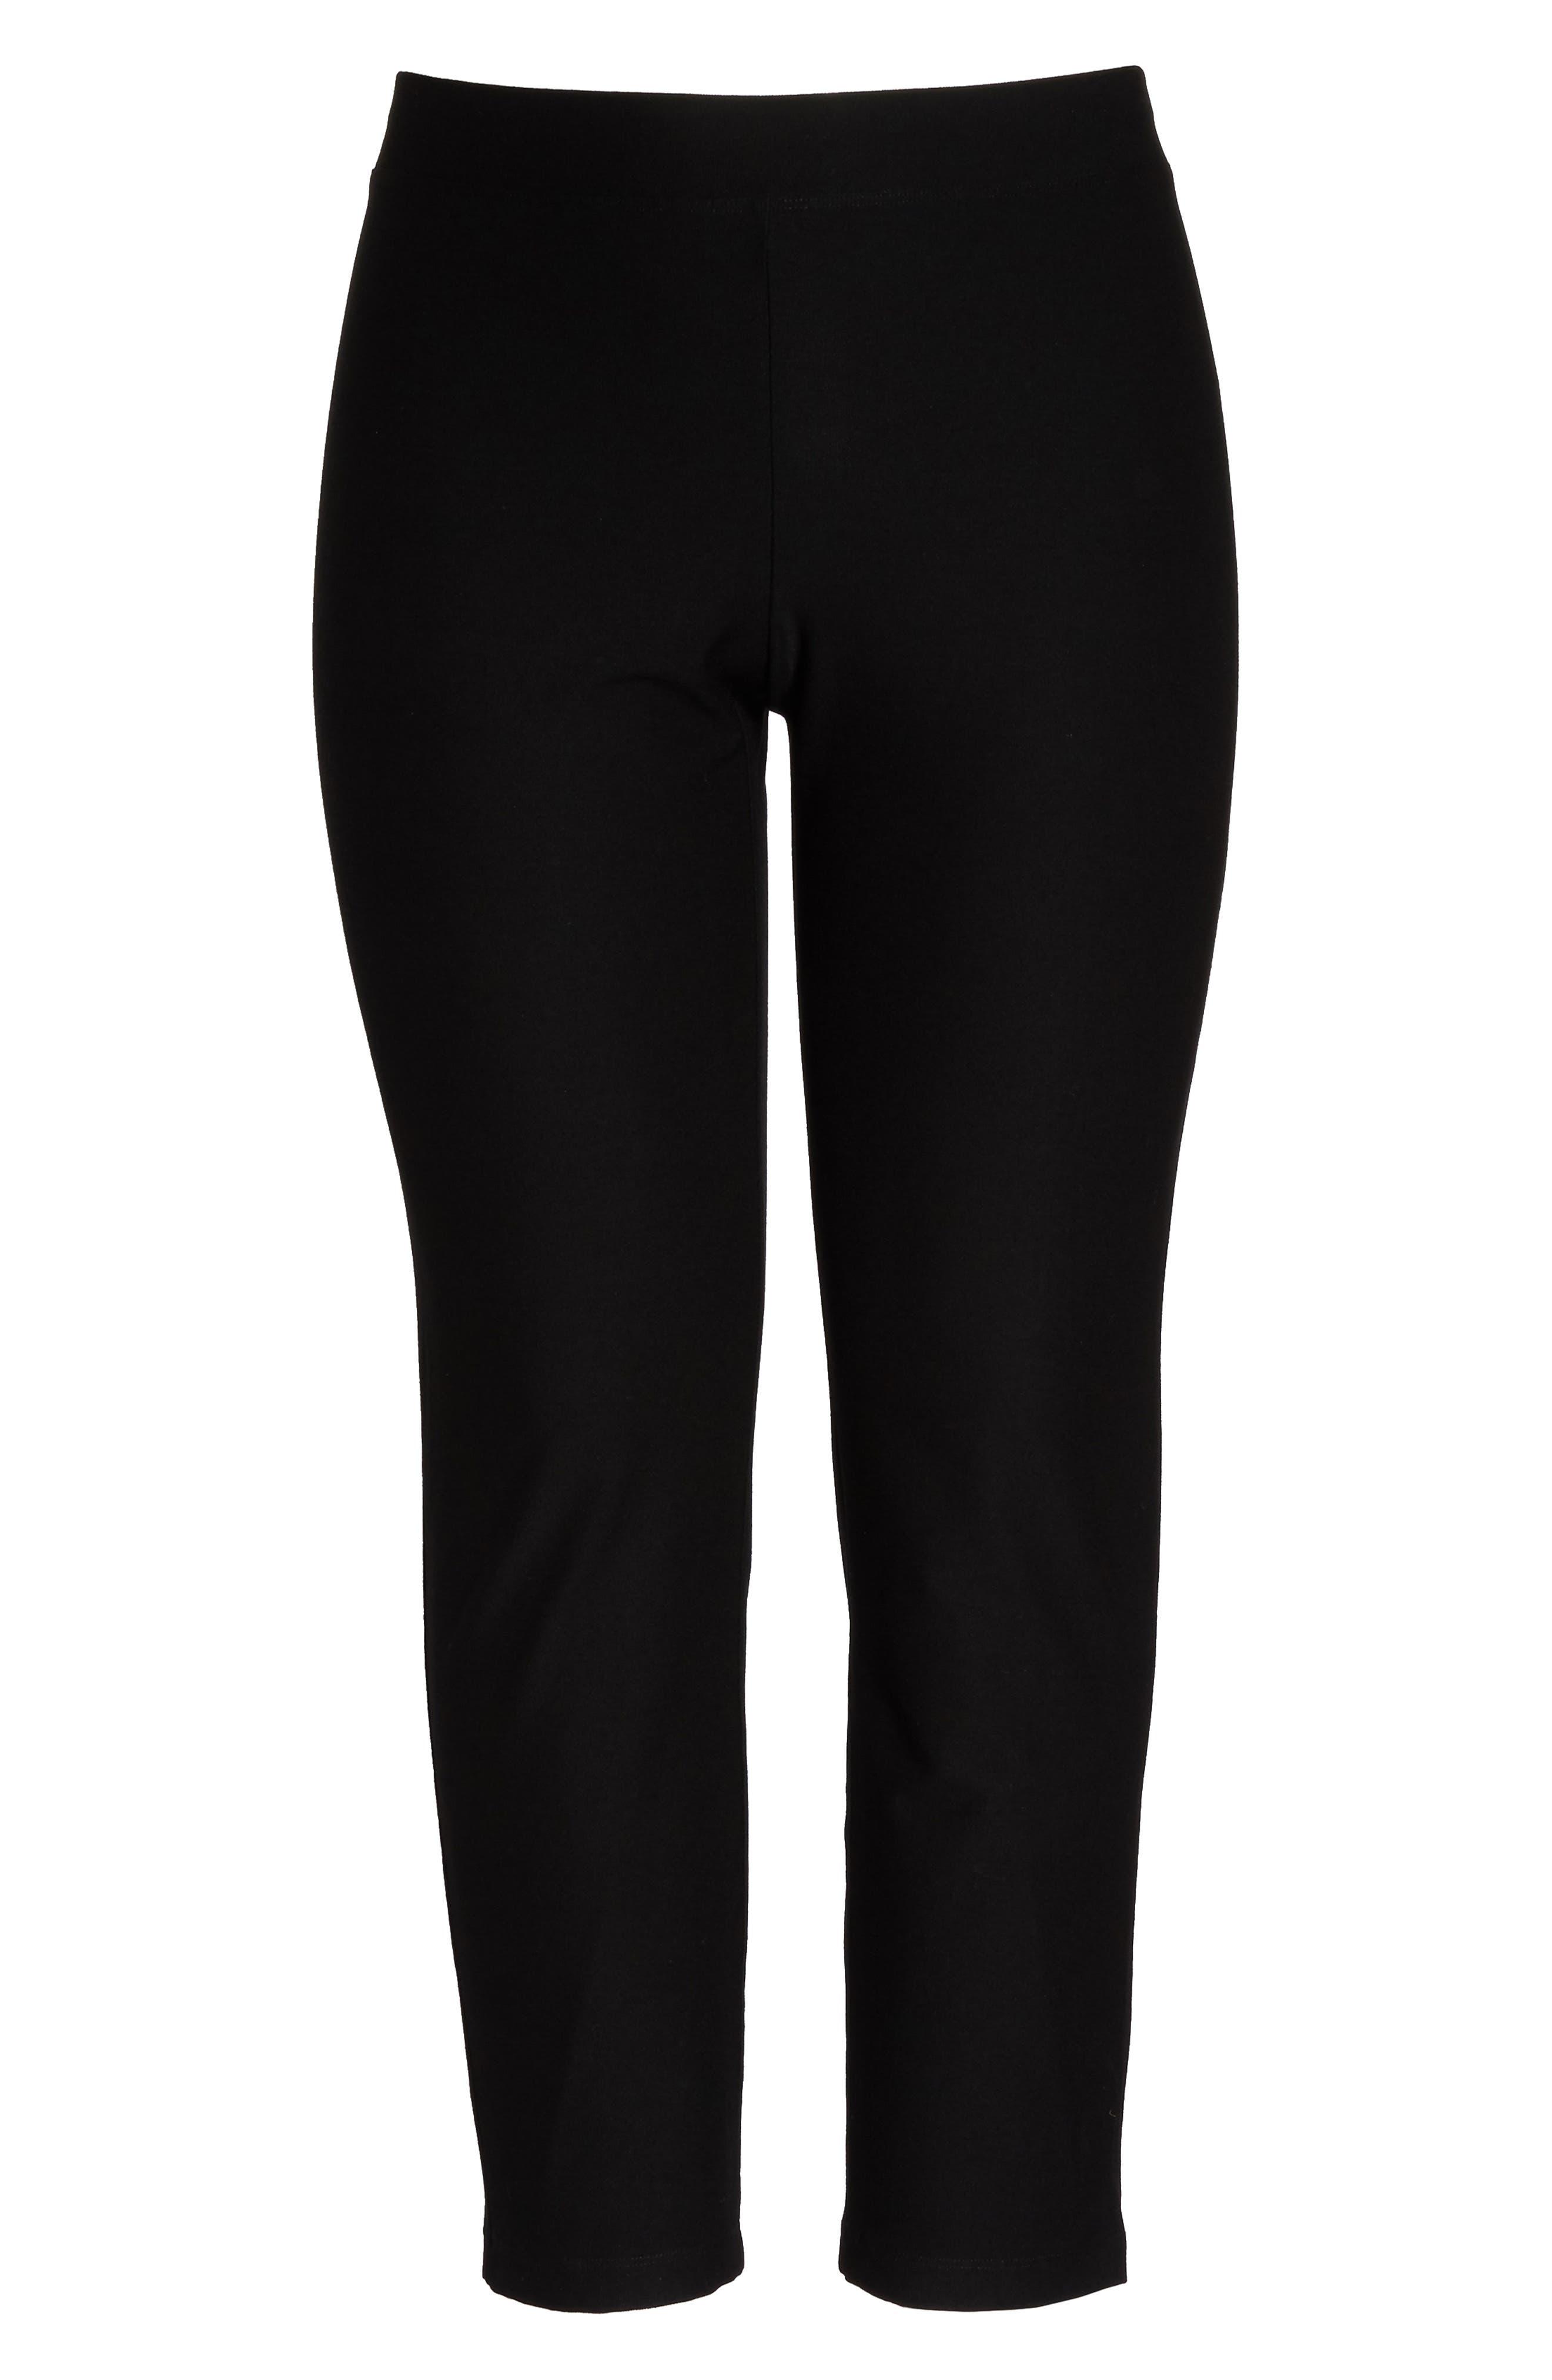 EILEEN FISHER, Crepe Ankle Pants, Main thumbnail 1, color, BLACK